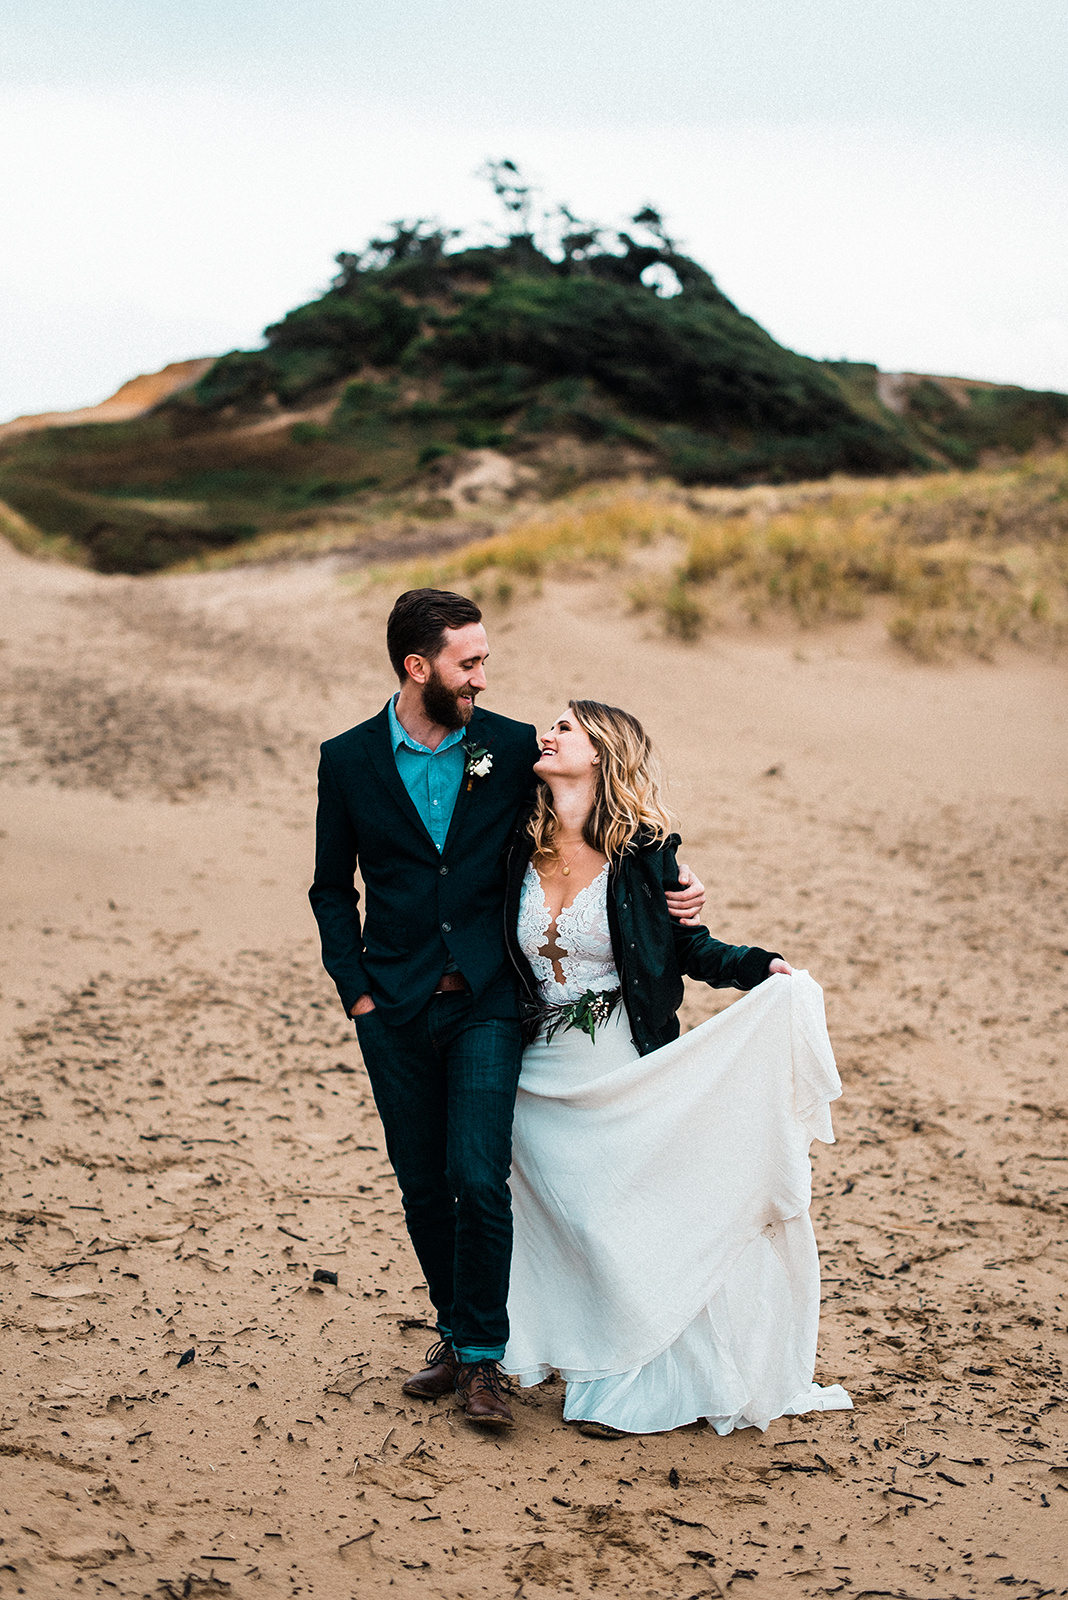 Oregon_Coast_Elopement_Wedding_The_Foxes_Photography_091.jpg